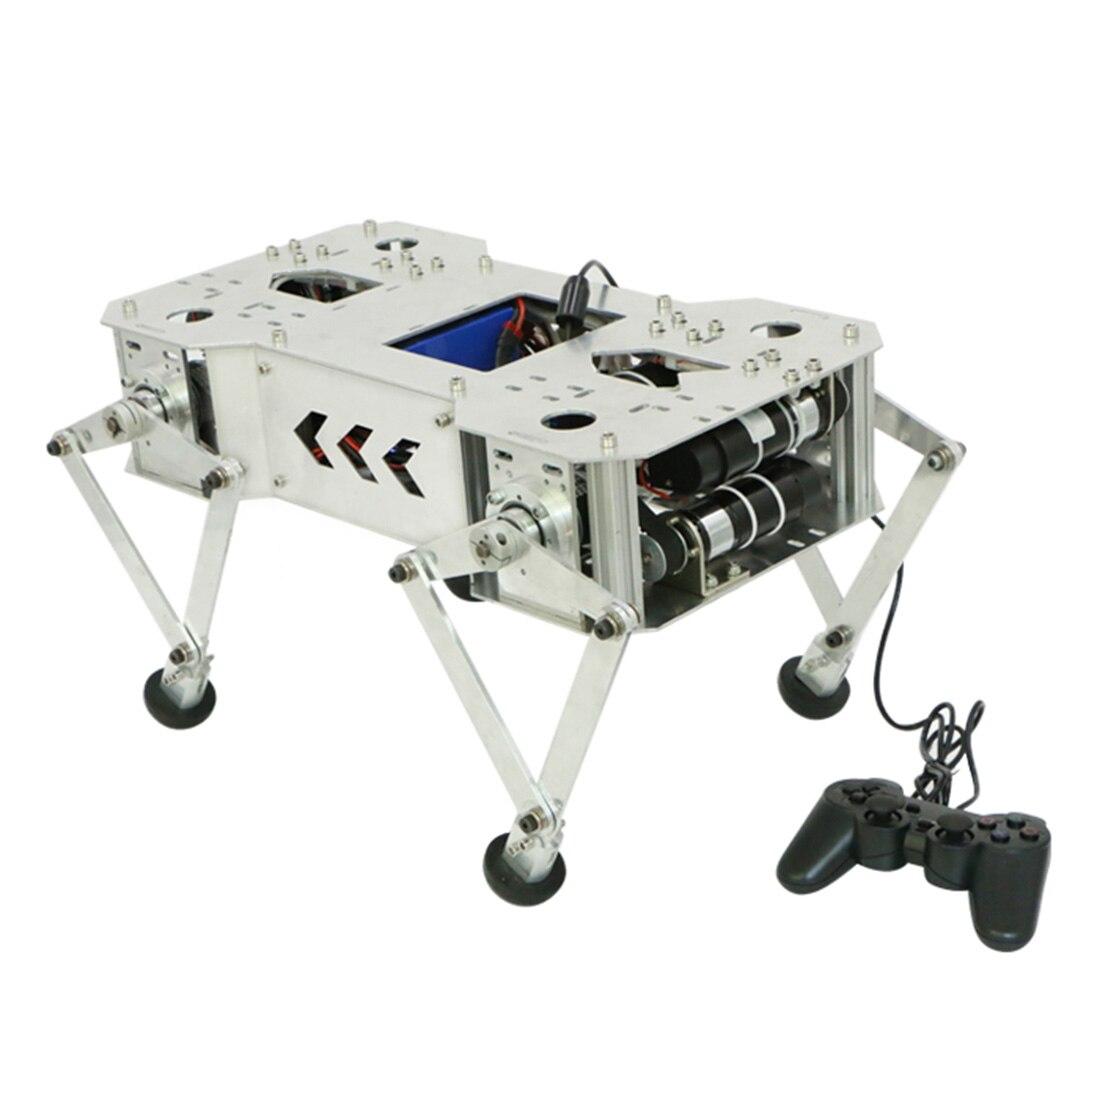 2020 Programmable Metal Mechanical Dog Bionic Quadruped Crawling Robot Toy